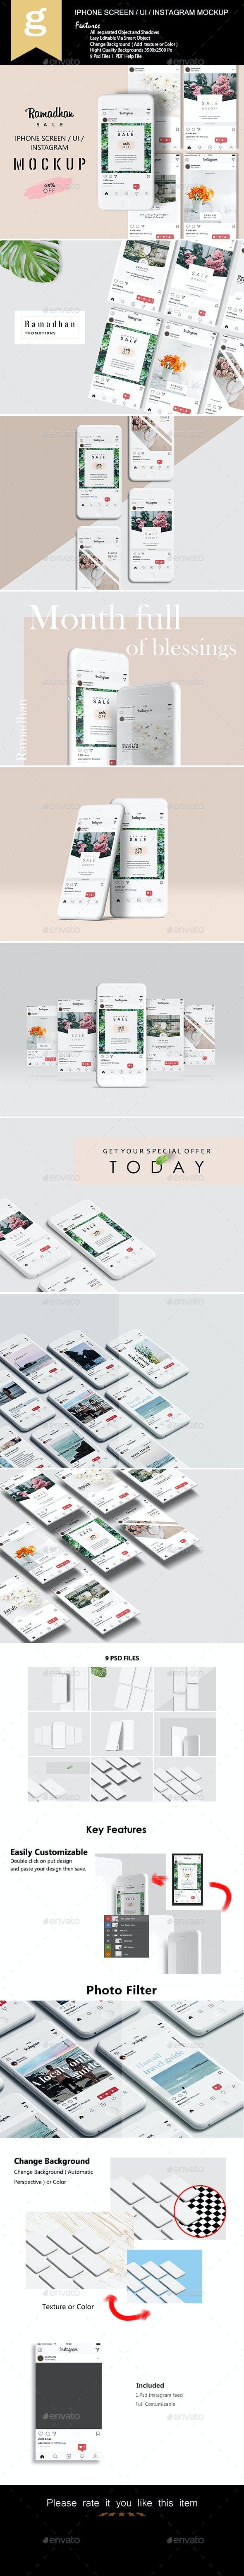 Phone Screen / UI / Instagram Mock-Up